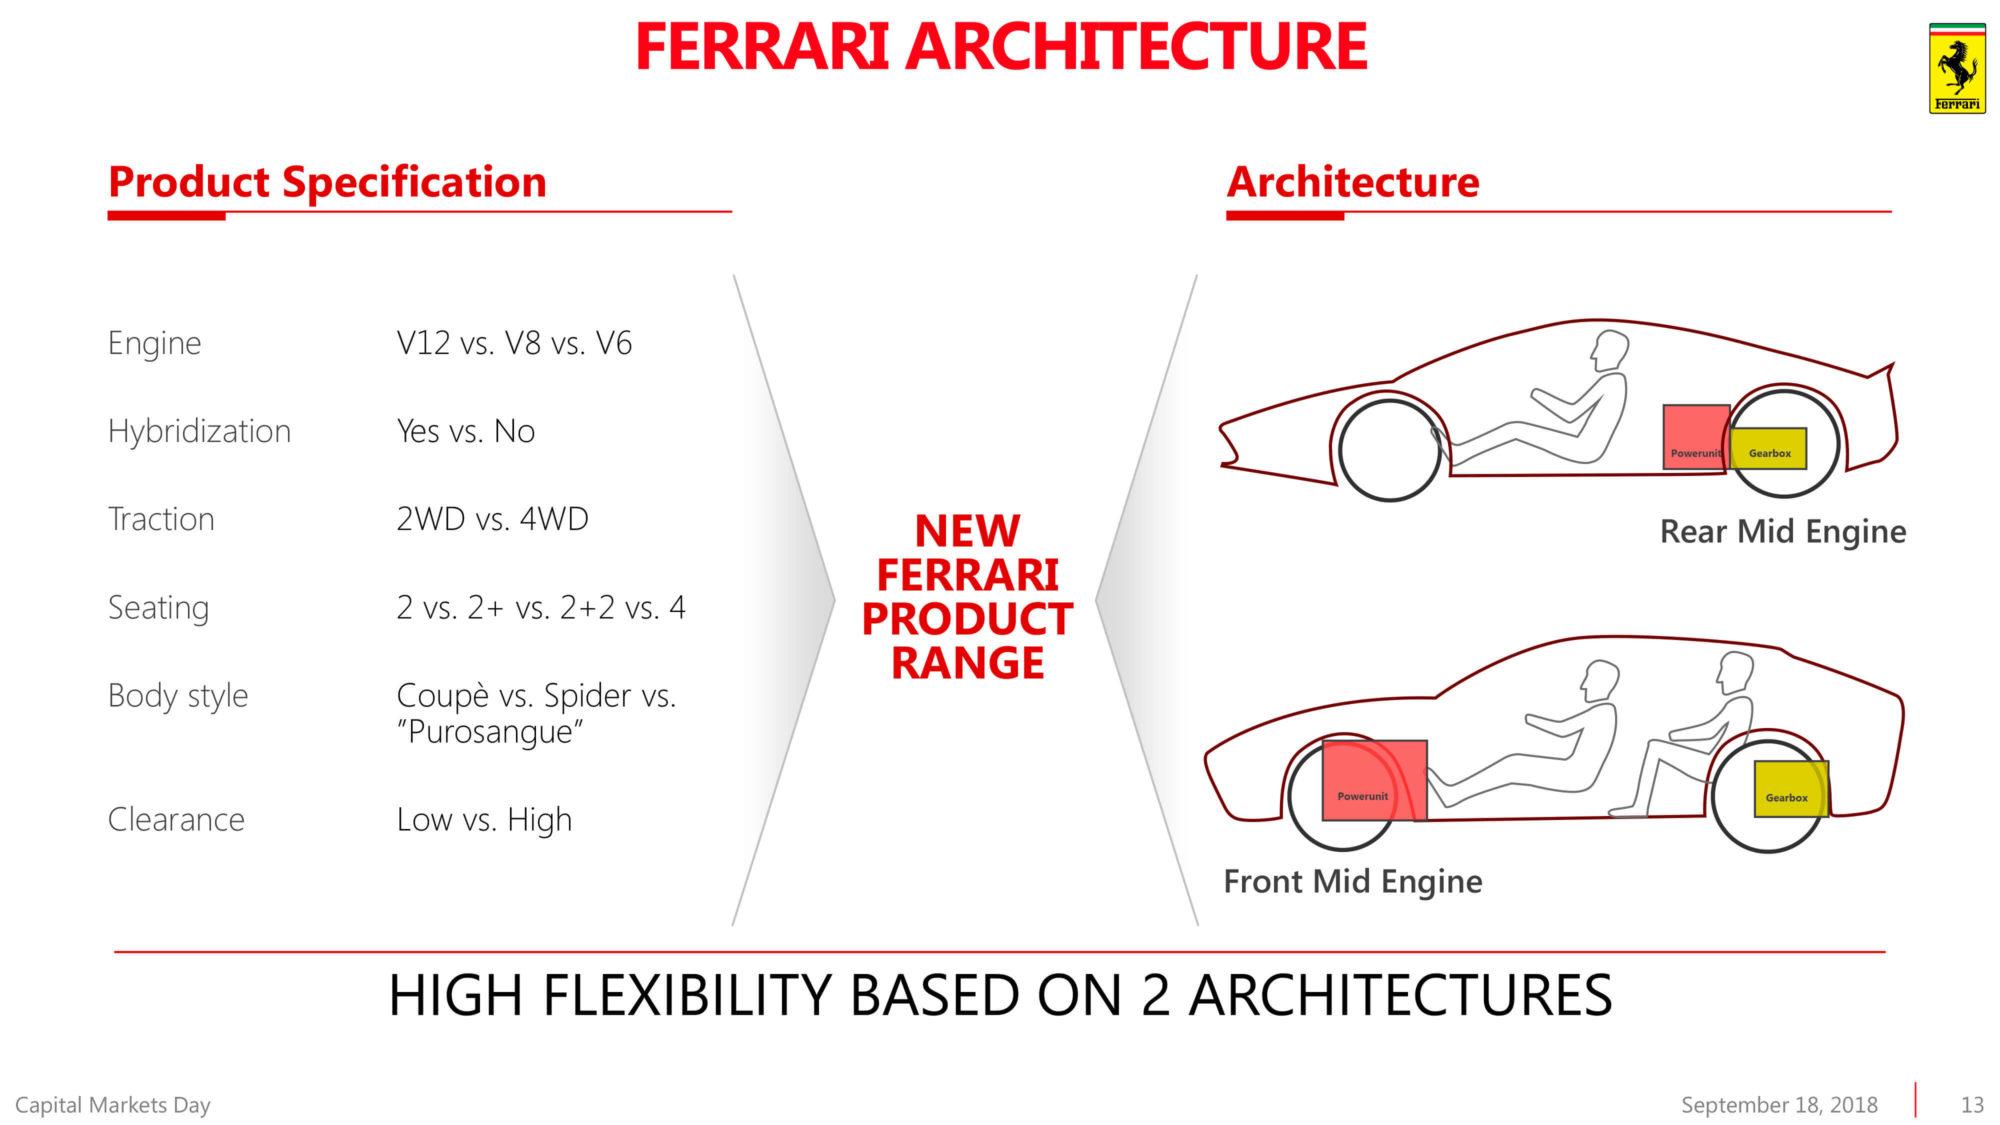 Ferrari planos futuro